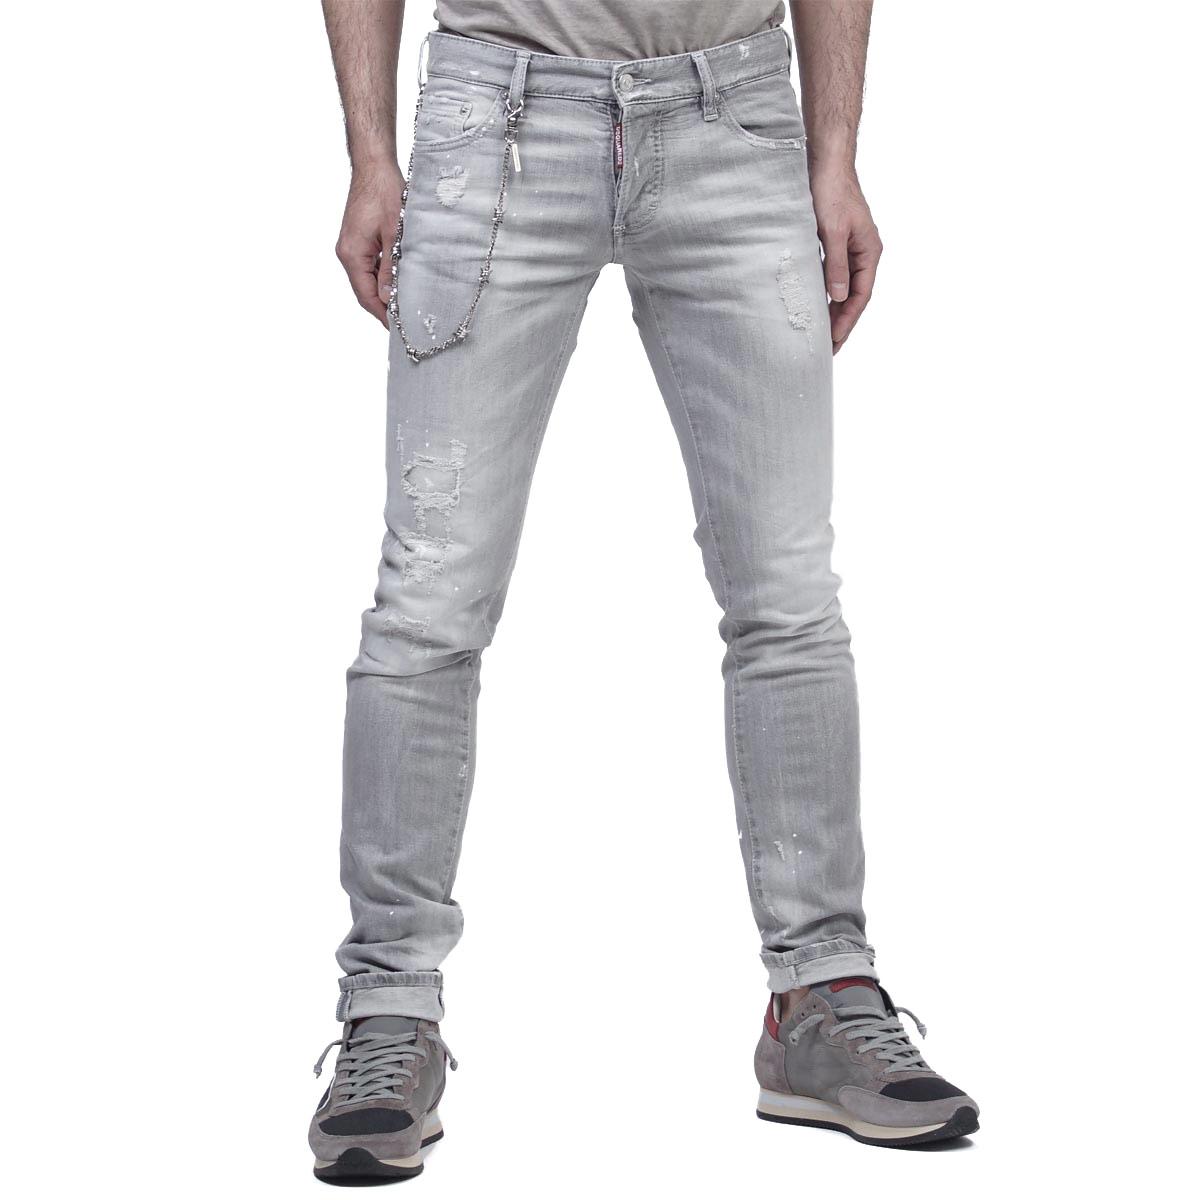 Dis kelp grouper ard DSQUARED2 button fried food jeans SLIM JEAN slim gray gray system s74lb0122 s30260 852 men